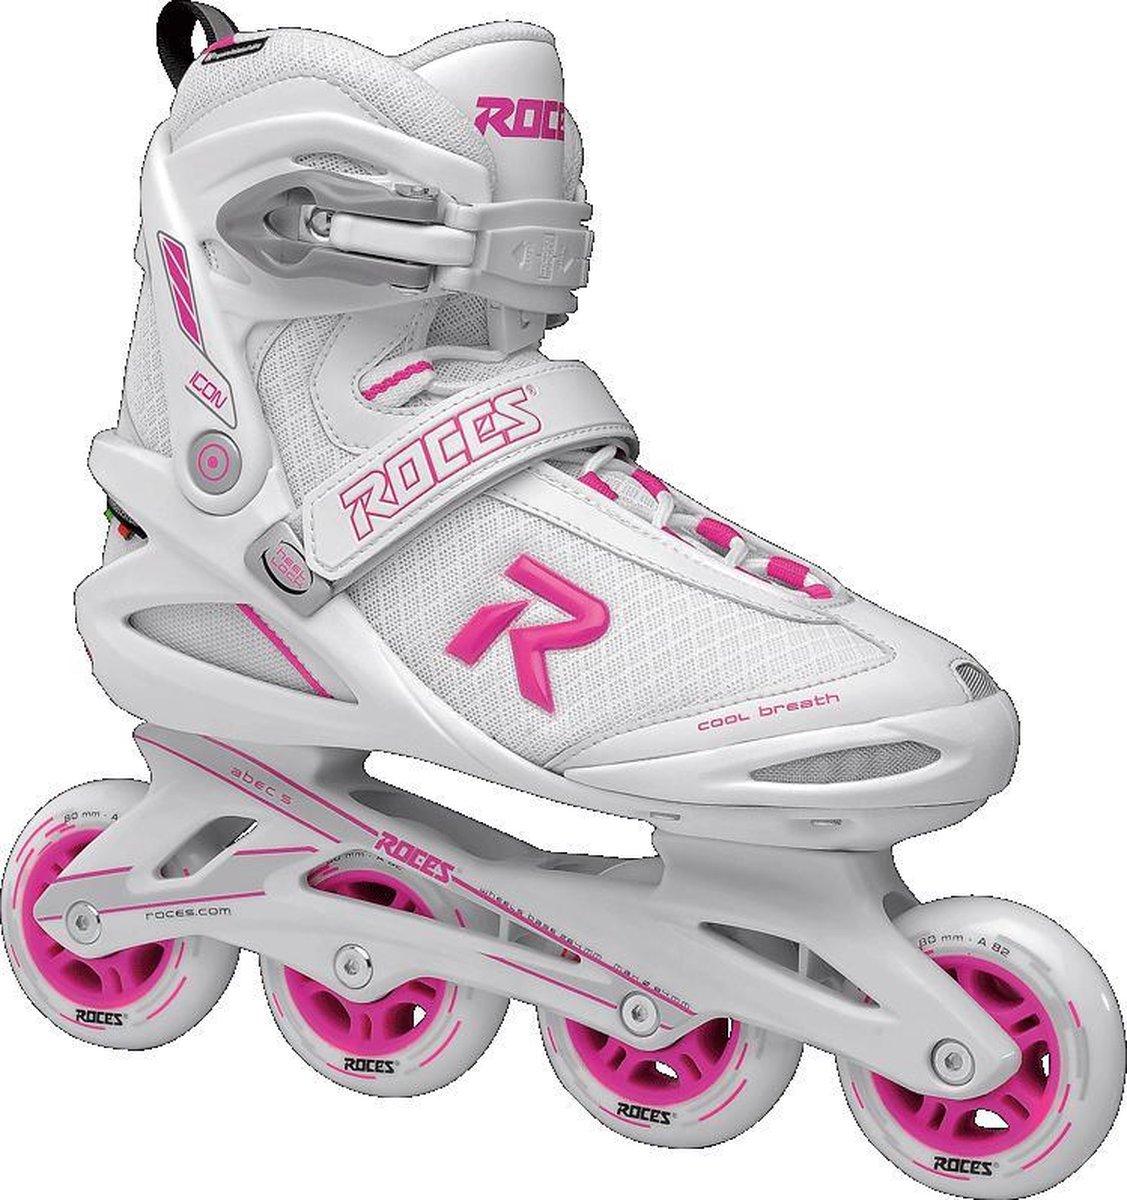 Roces Icon Women's inline skates - maat 36 - 80mm white / magenta